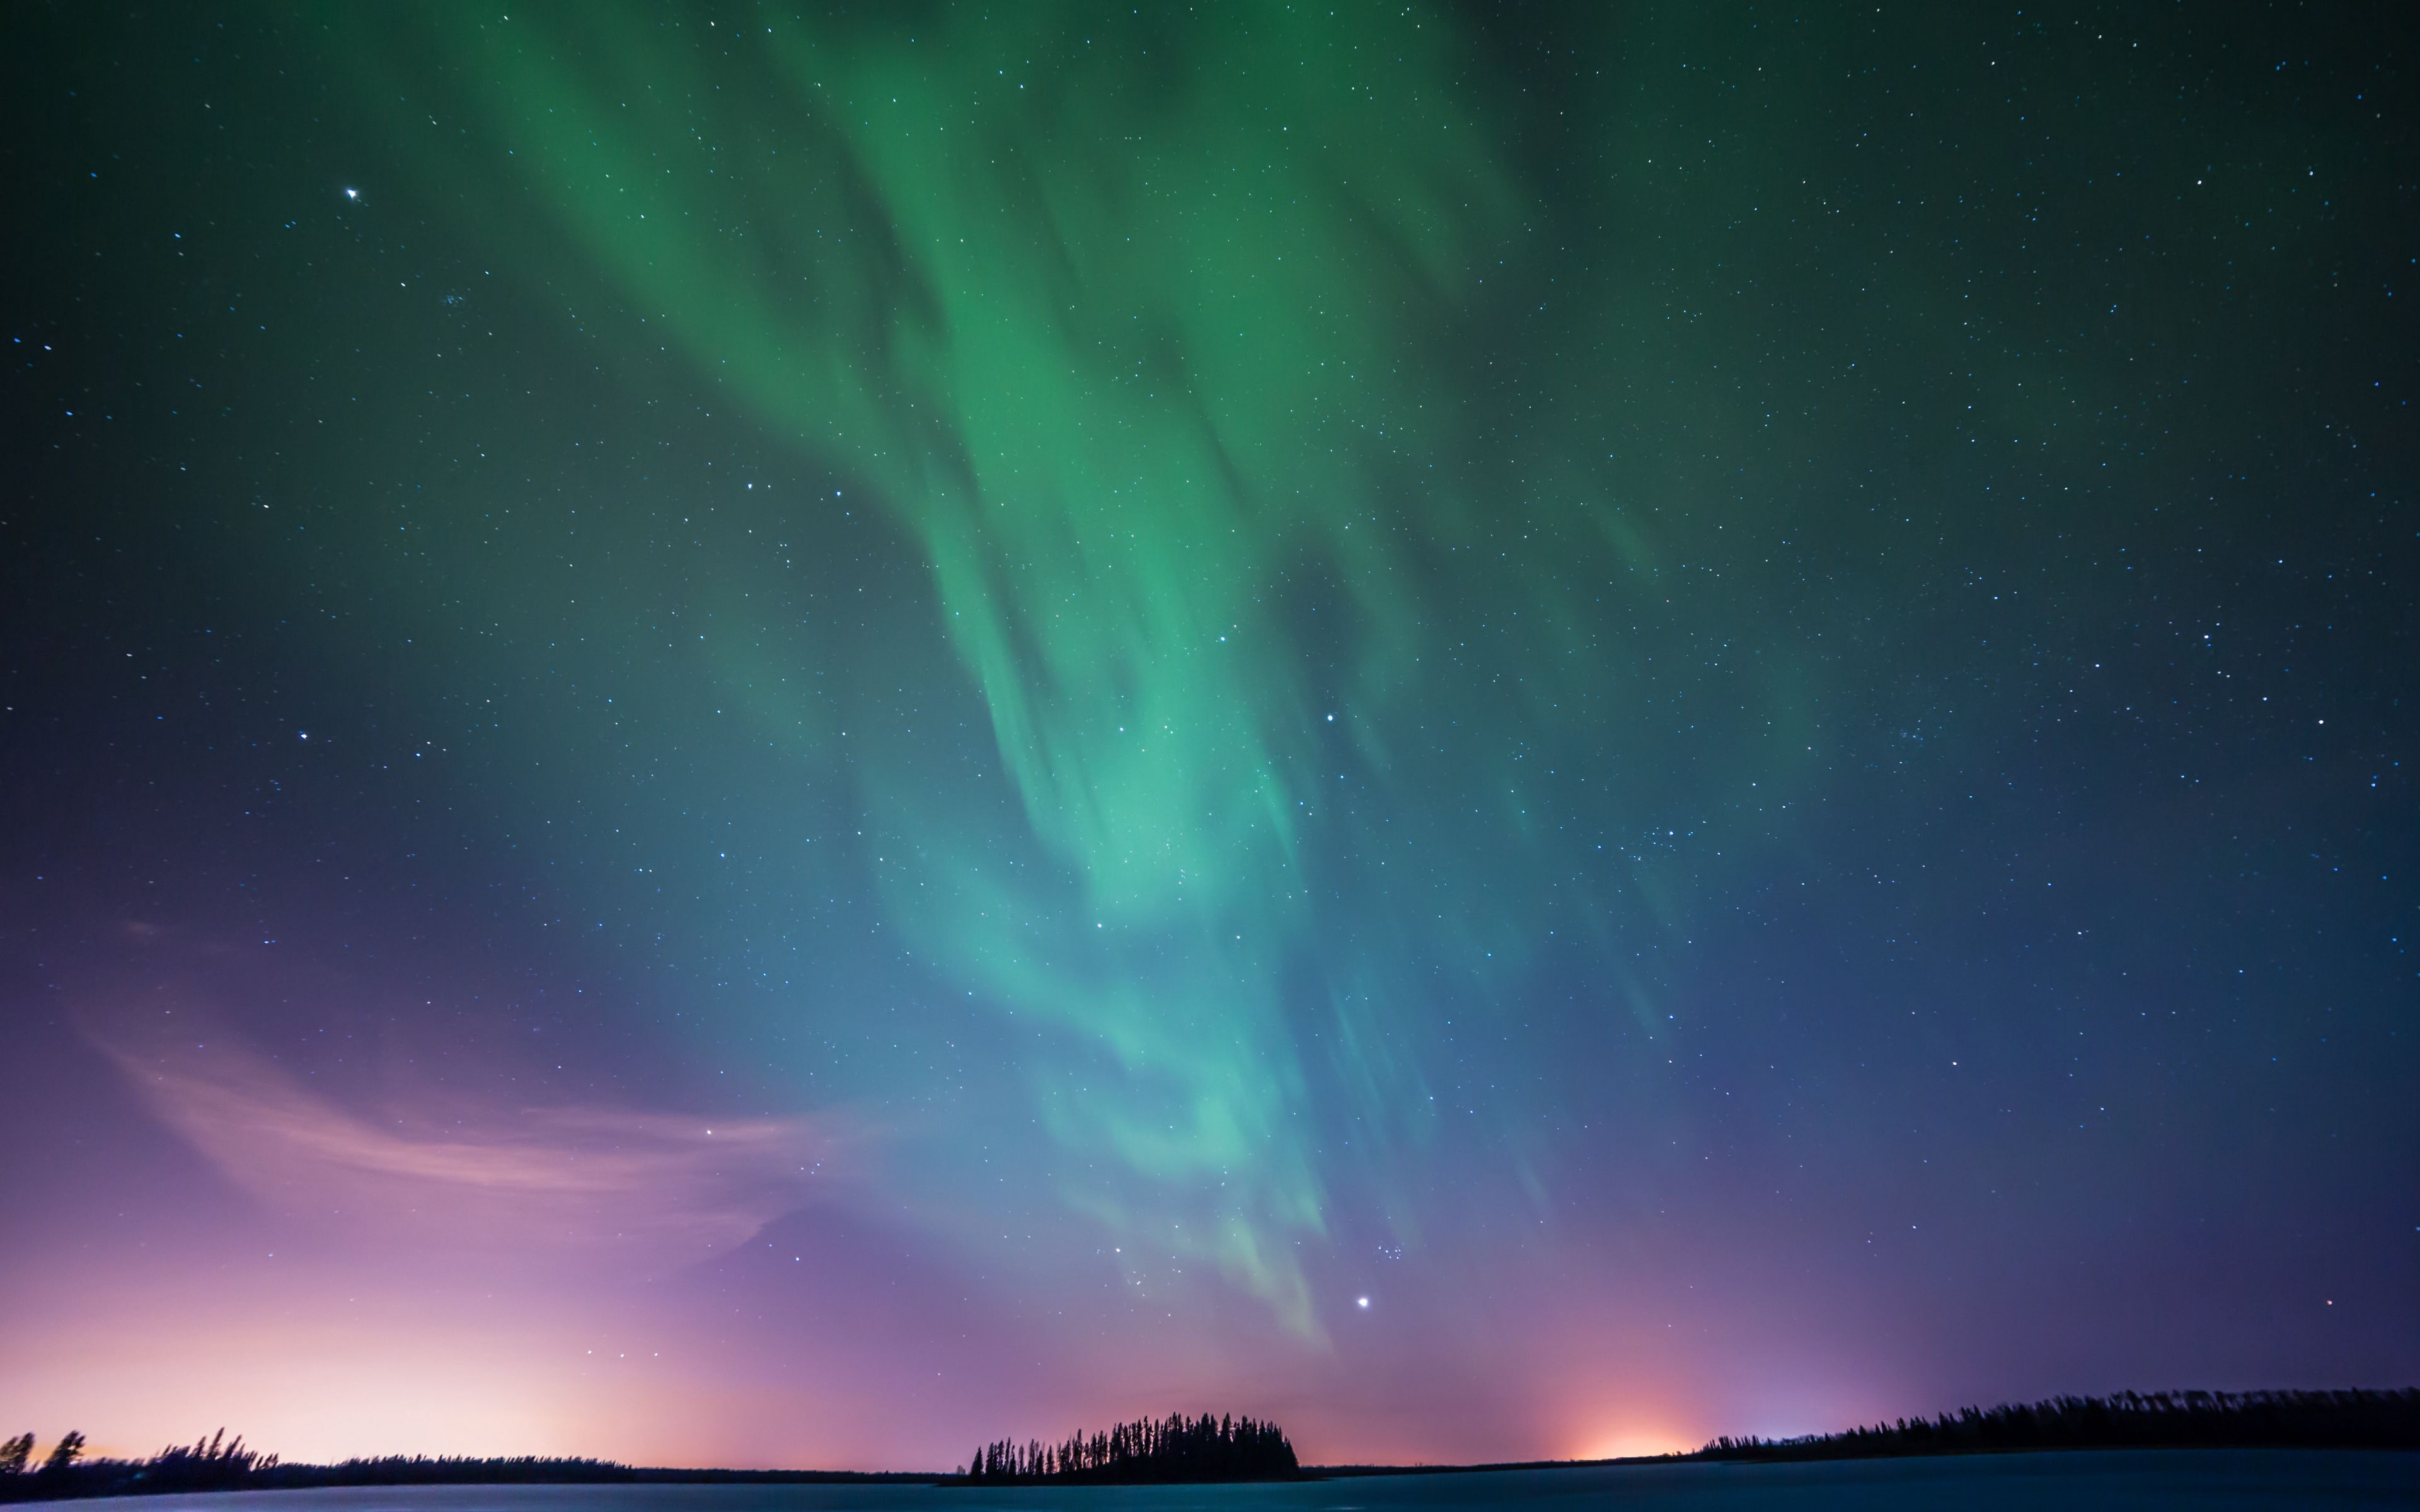 Wallpaper Northern Lights Aurora Borealis Aurora Northern Lights Wallpaper 8k 3840x2400 Download Hd Wallpaper Wallpapertip